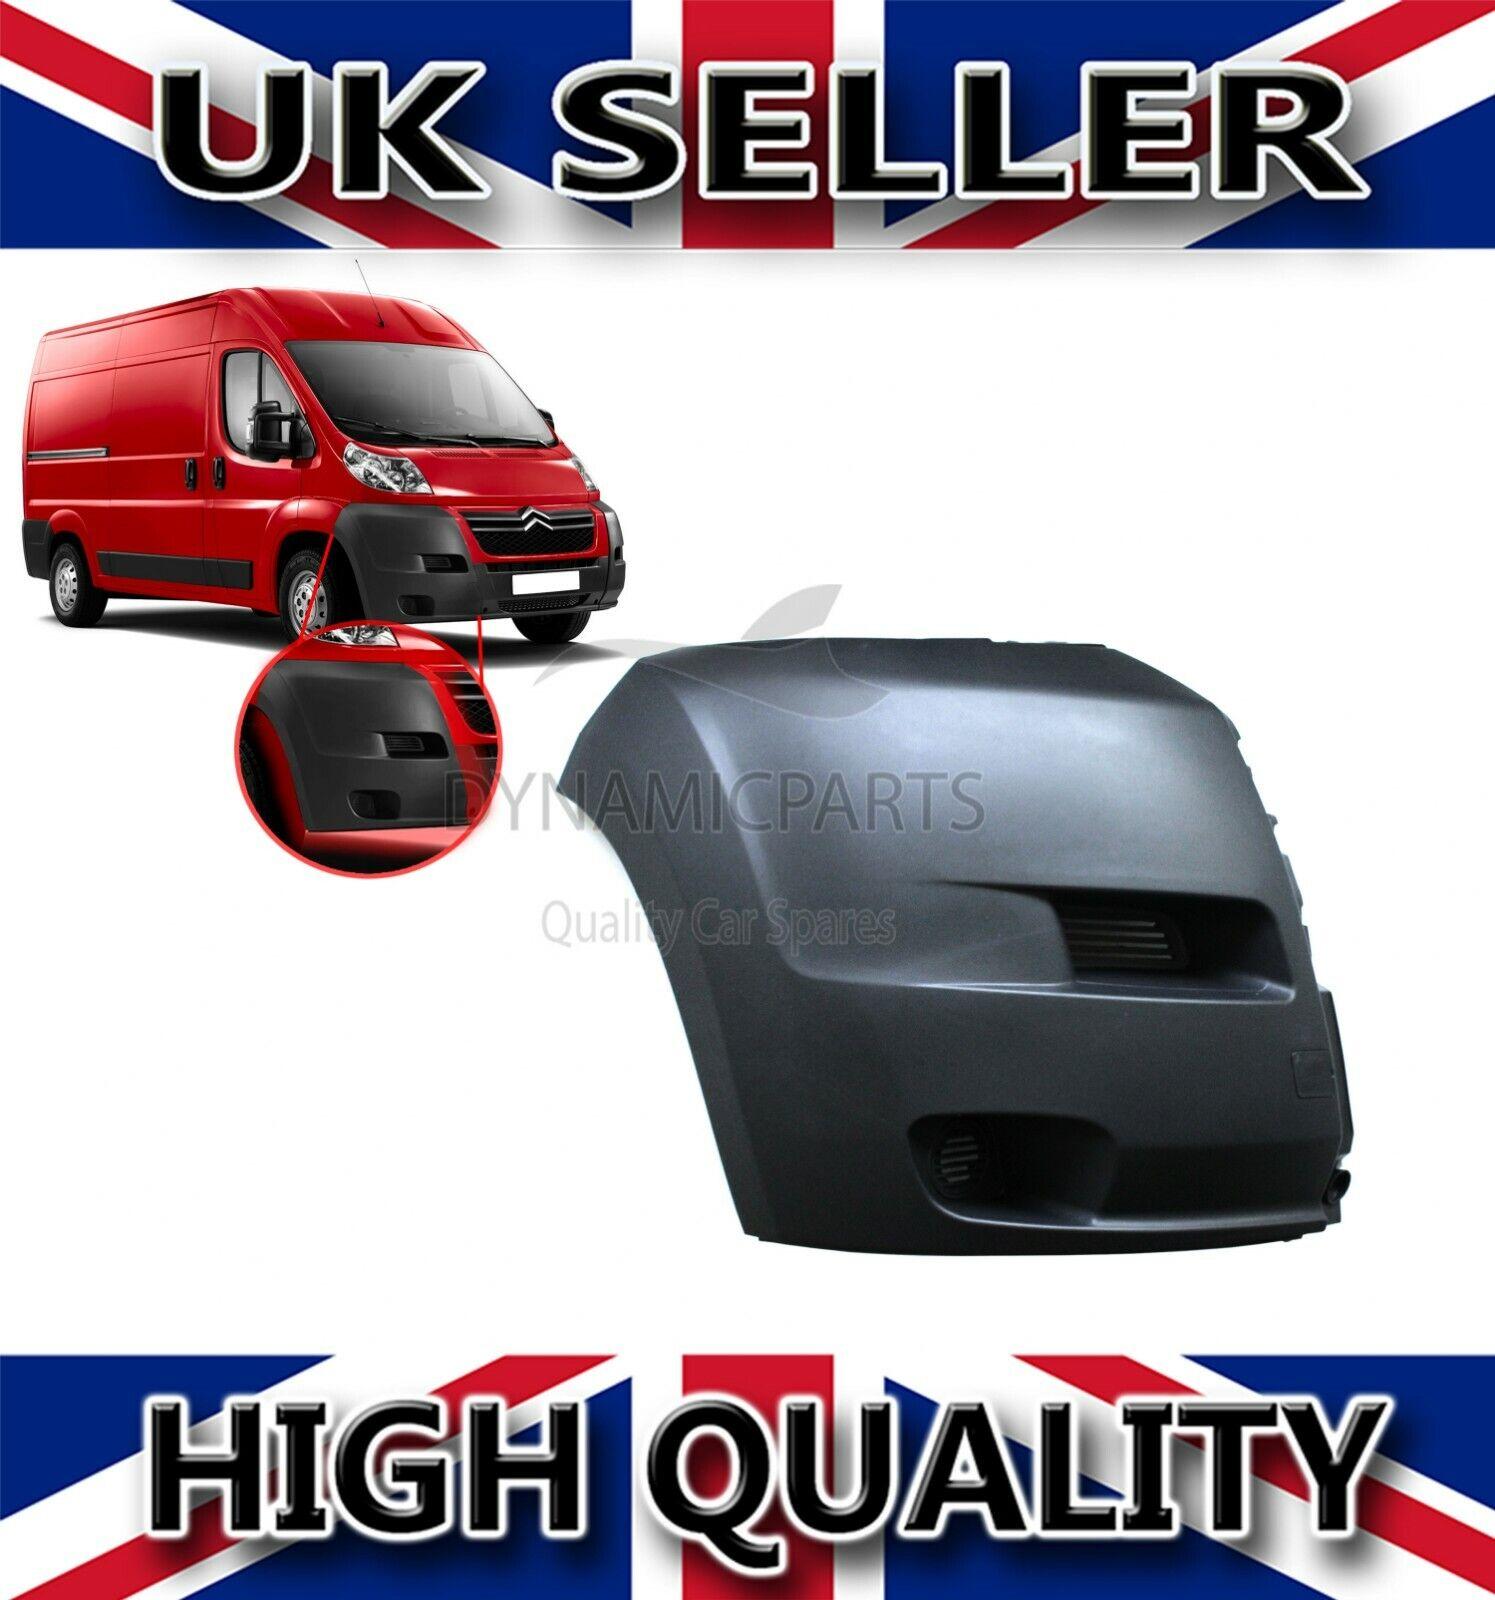 2006-2014 Peugeot Boxer Front Bumper End Corner Passenger Side New High Quality